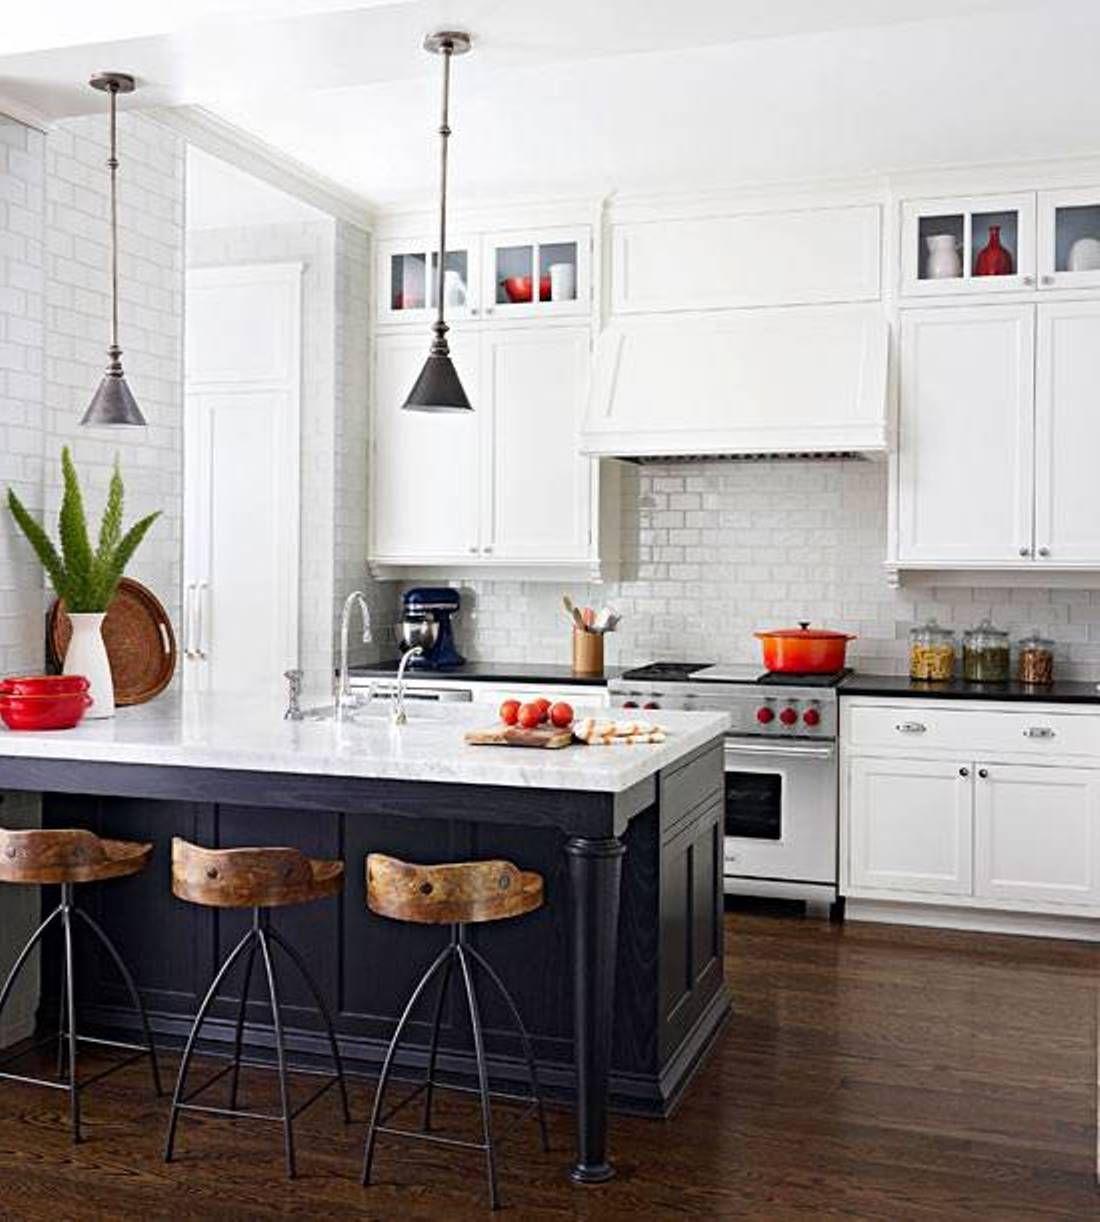 kitchen island with open kitchen floor plans kitchen design open kitchen tiles design best on kitchen remodel planner id=52666